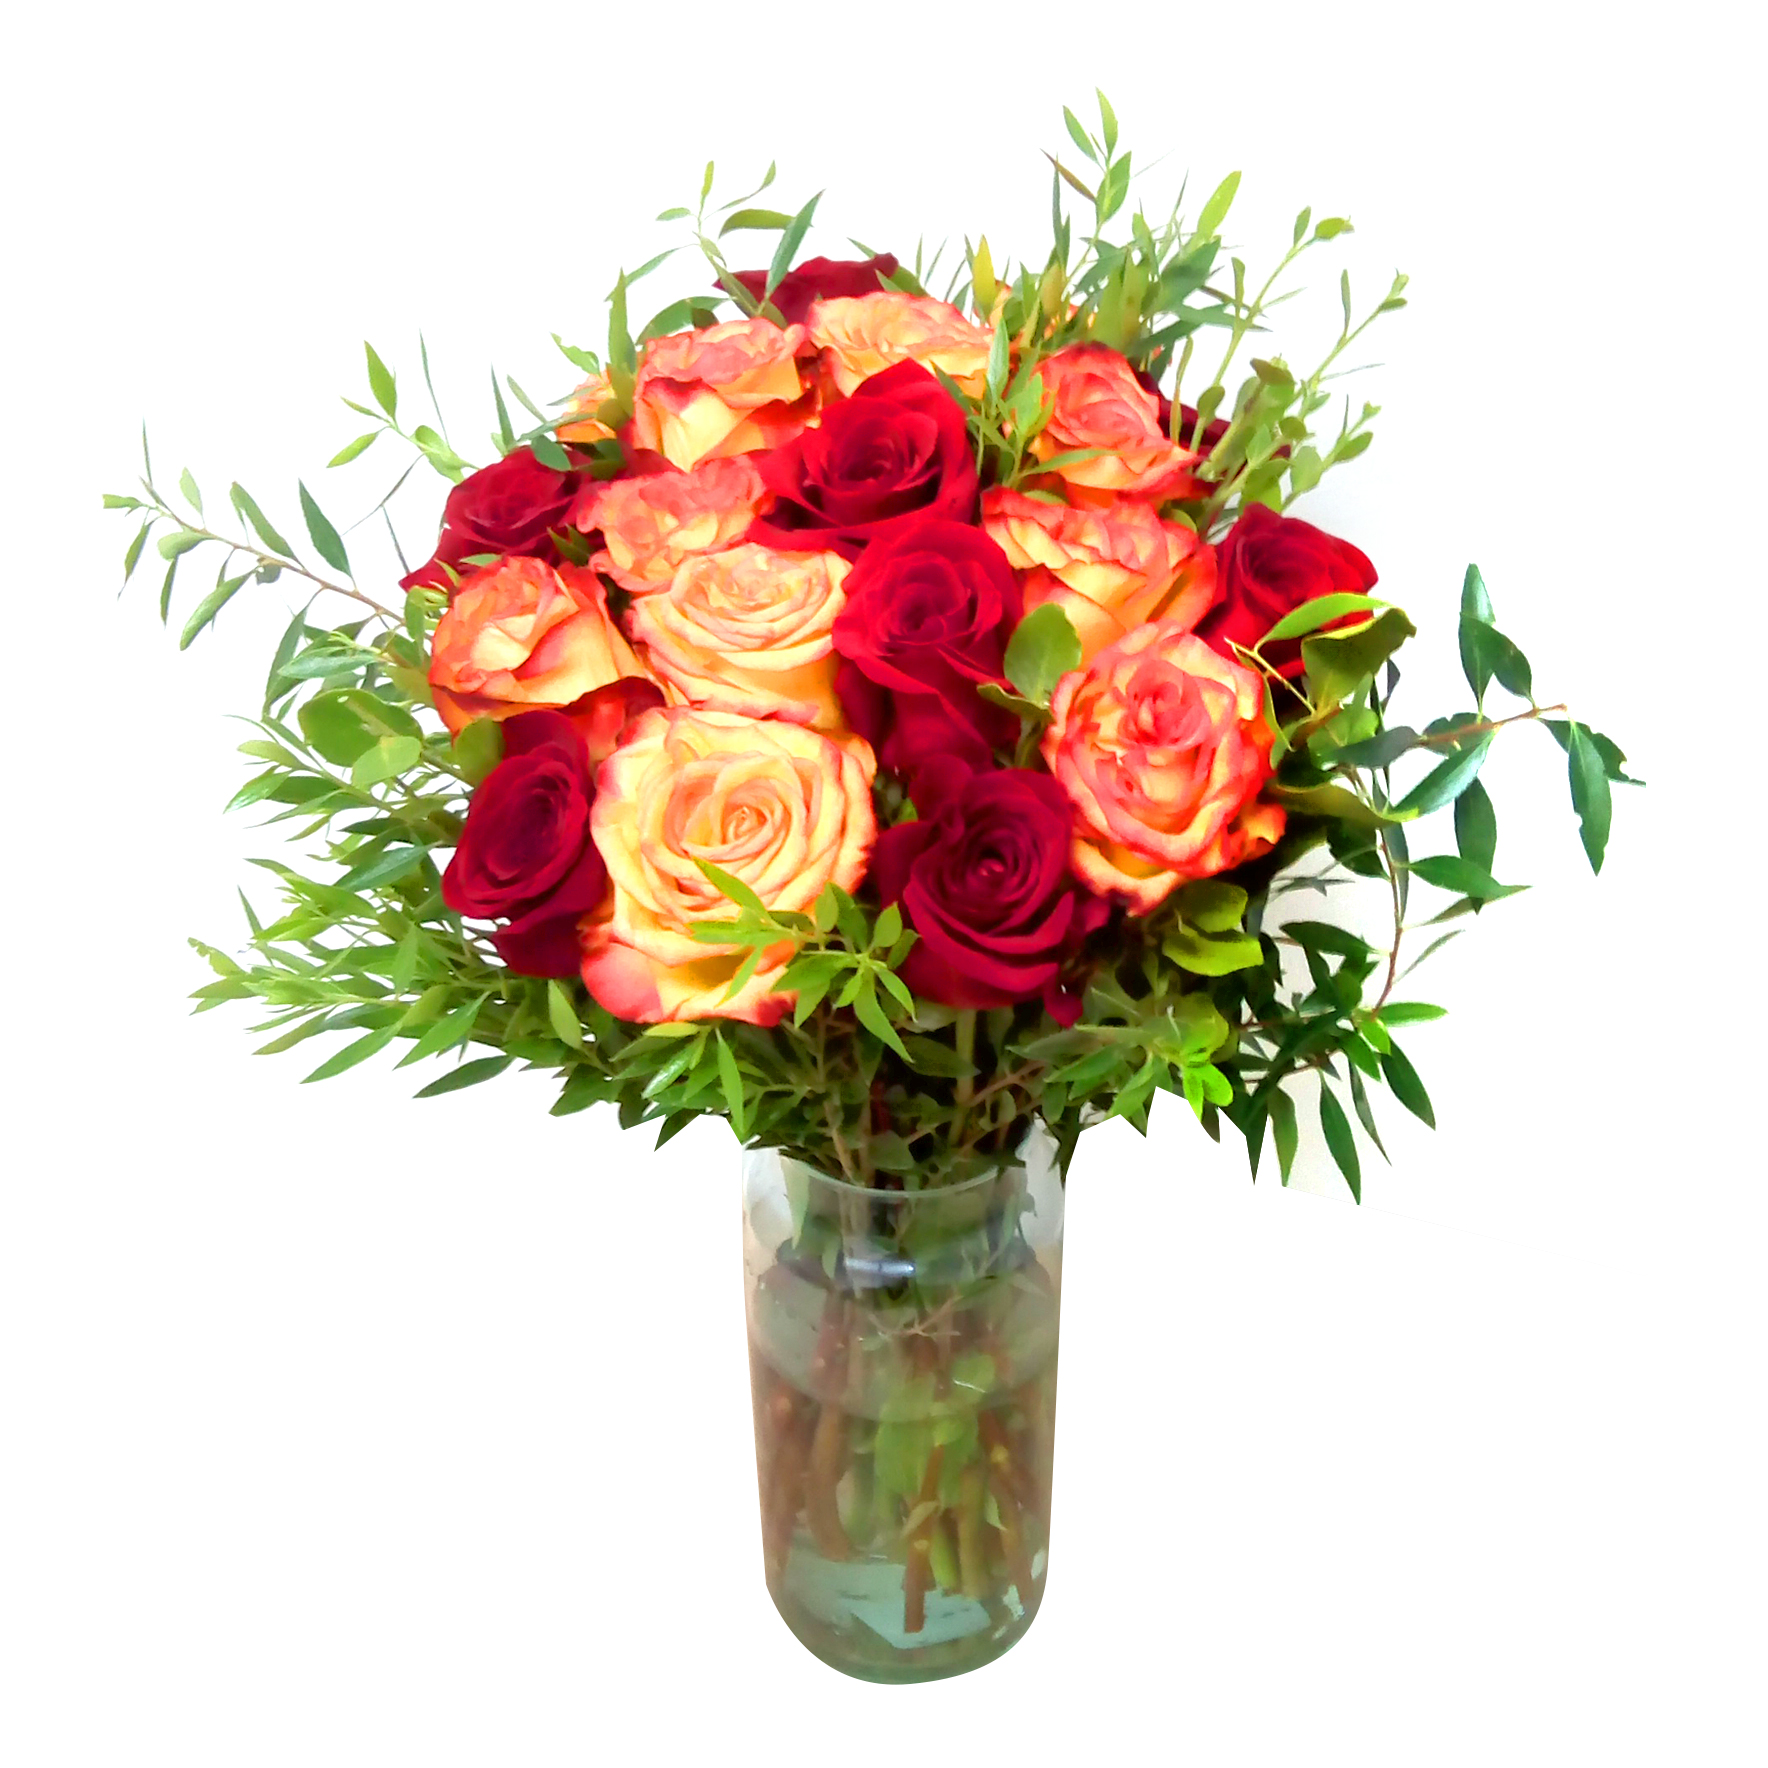 Floreros de Rosas Rojas, Damasco y Ruscus